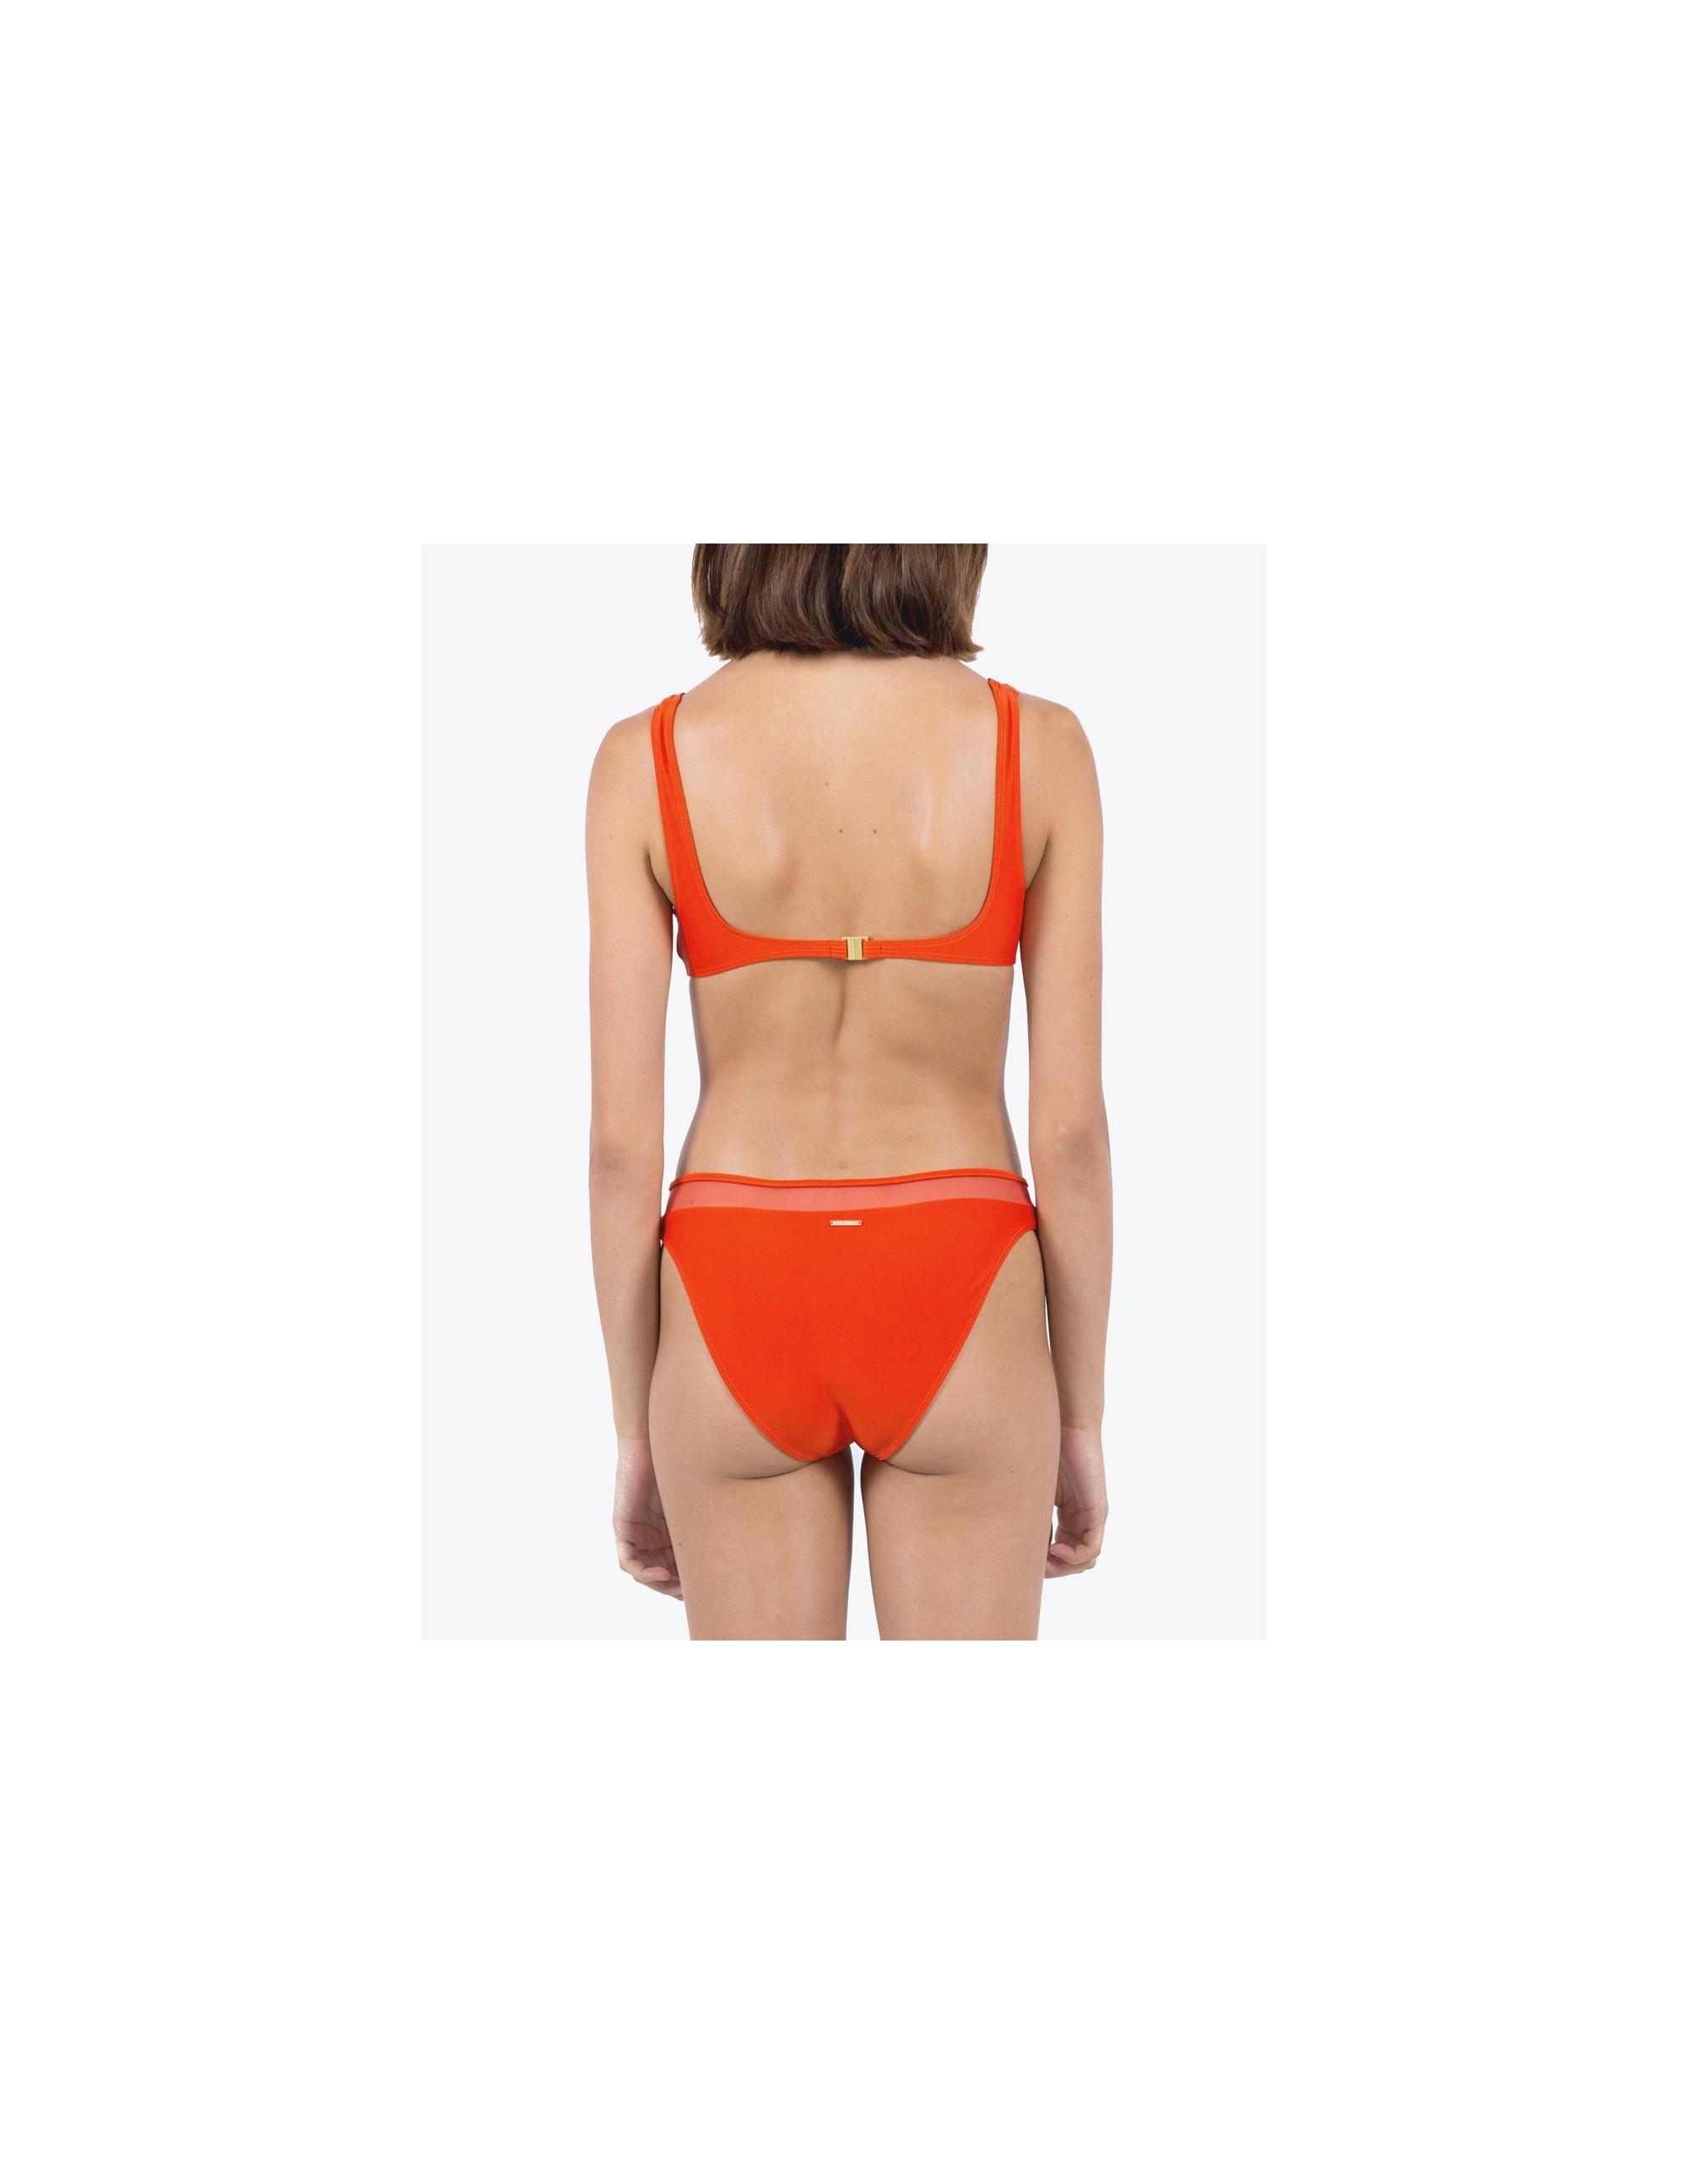 JAZ bikini bottom - CHARACTER RED